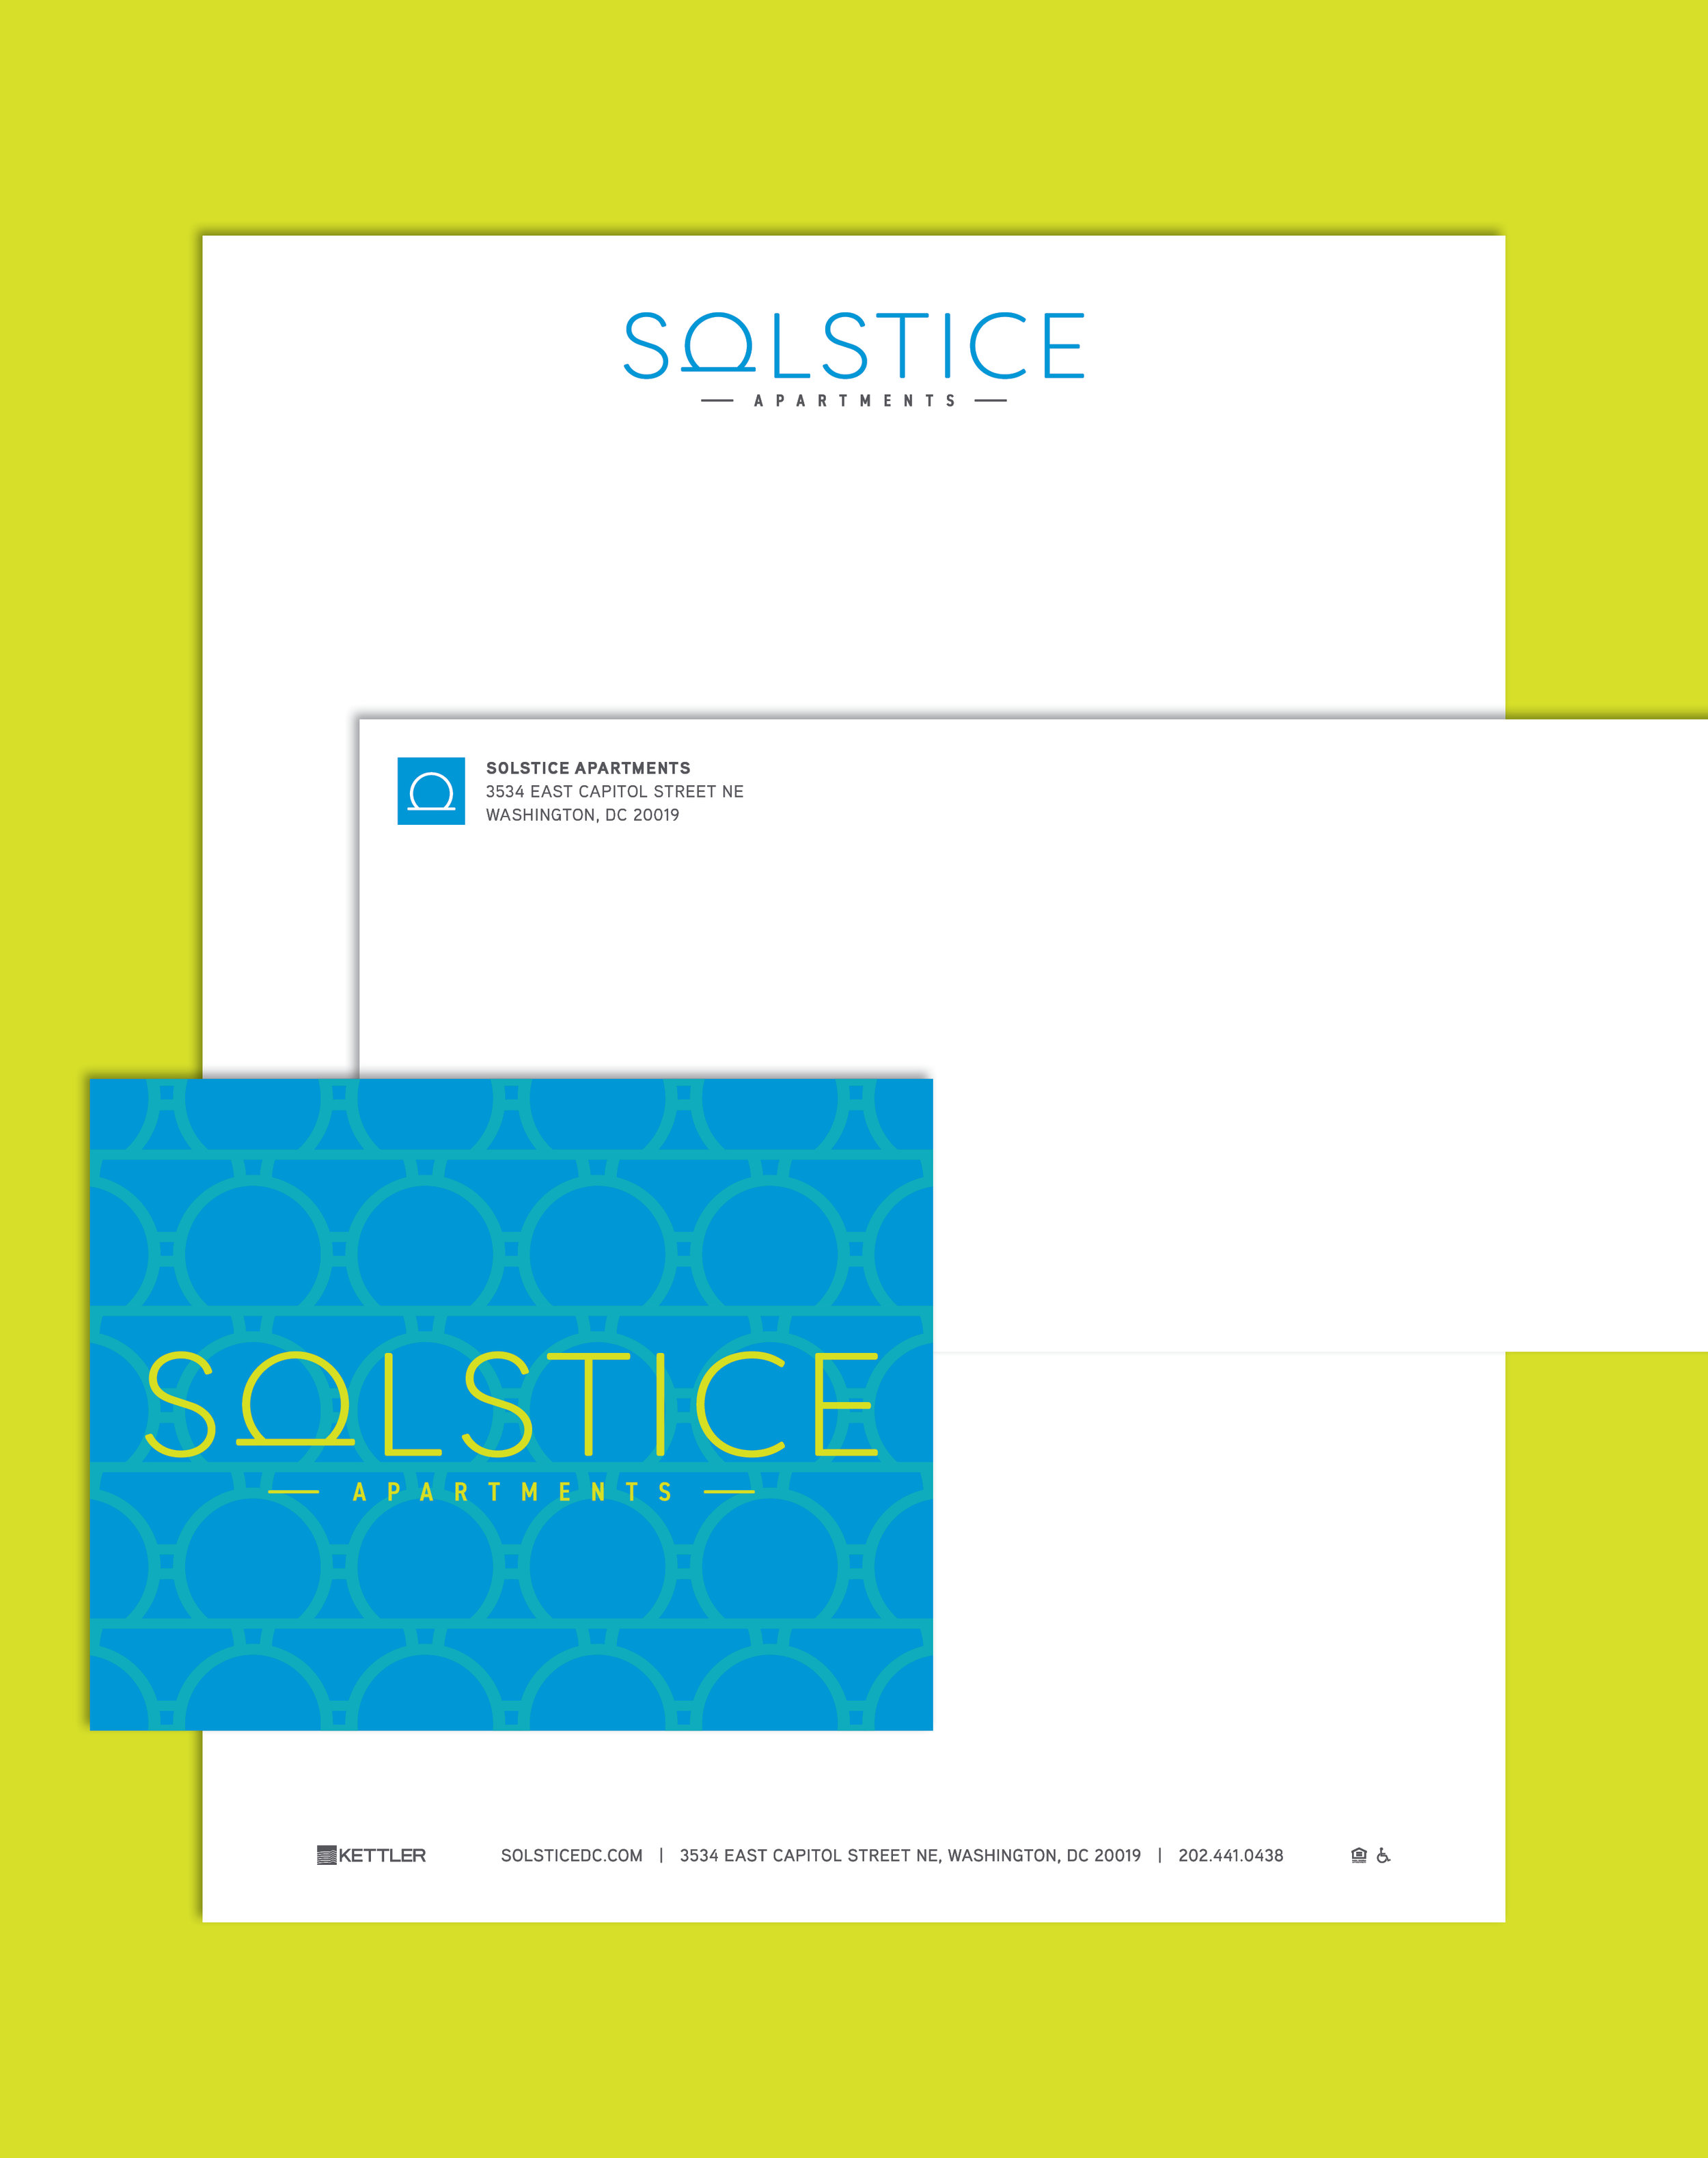 Solstice Letterhead, Envelope & Notecard